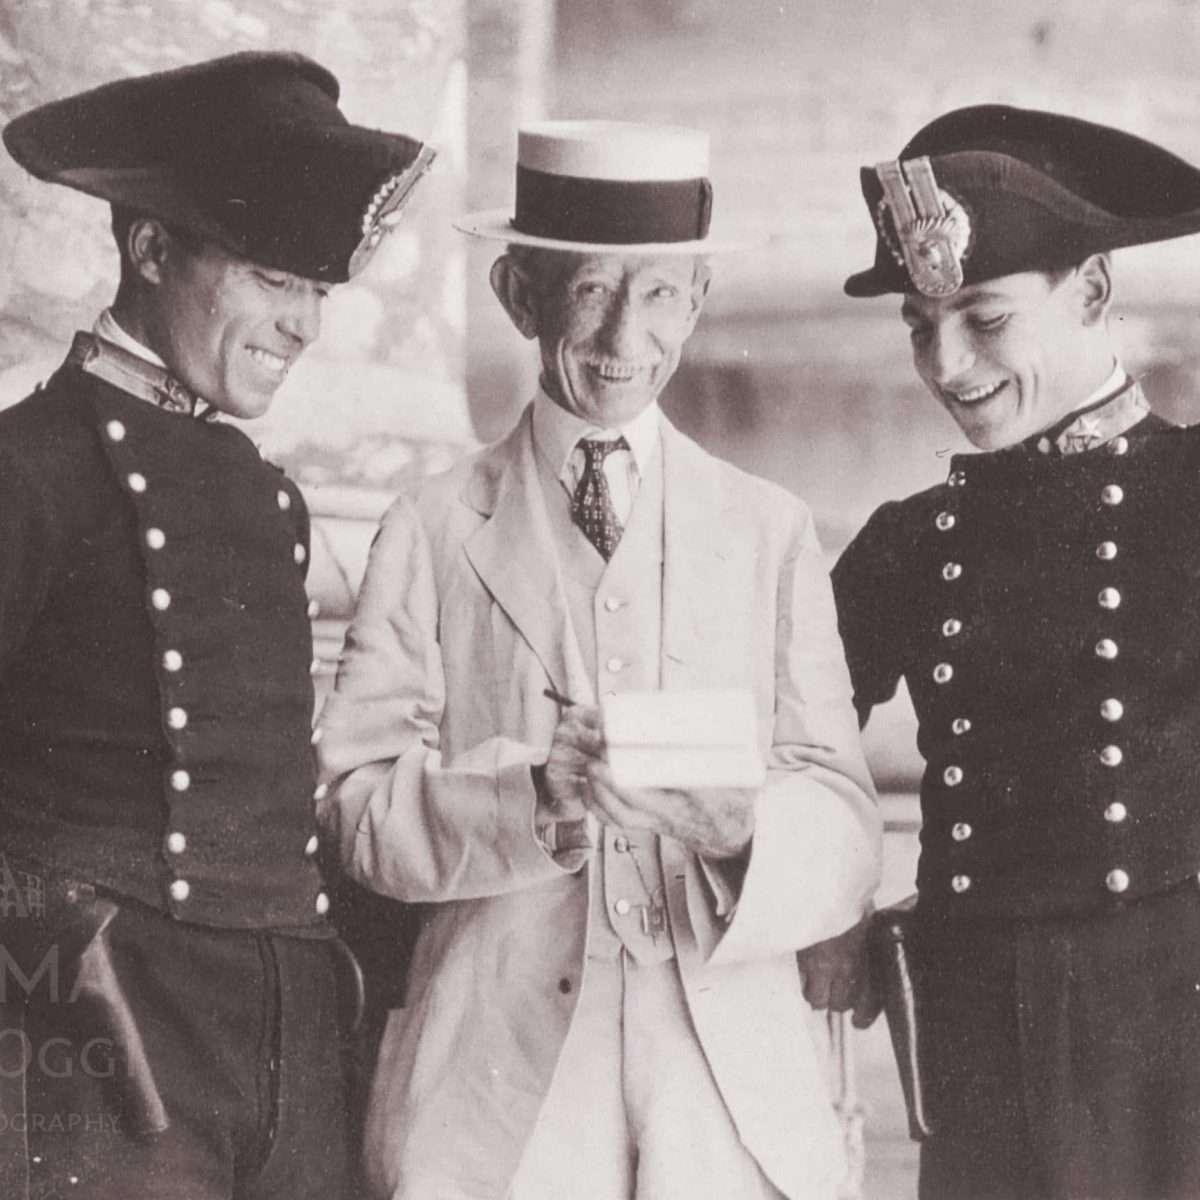 Carpenter in compagnia di due carabinieri